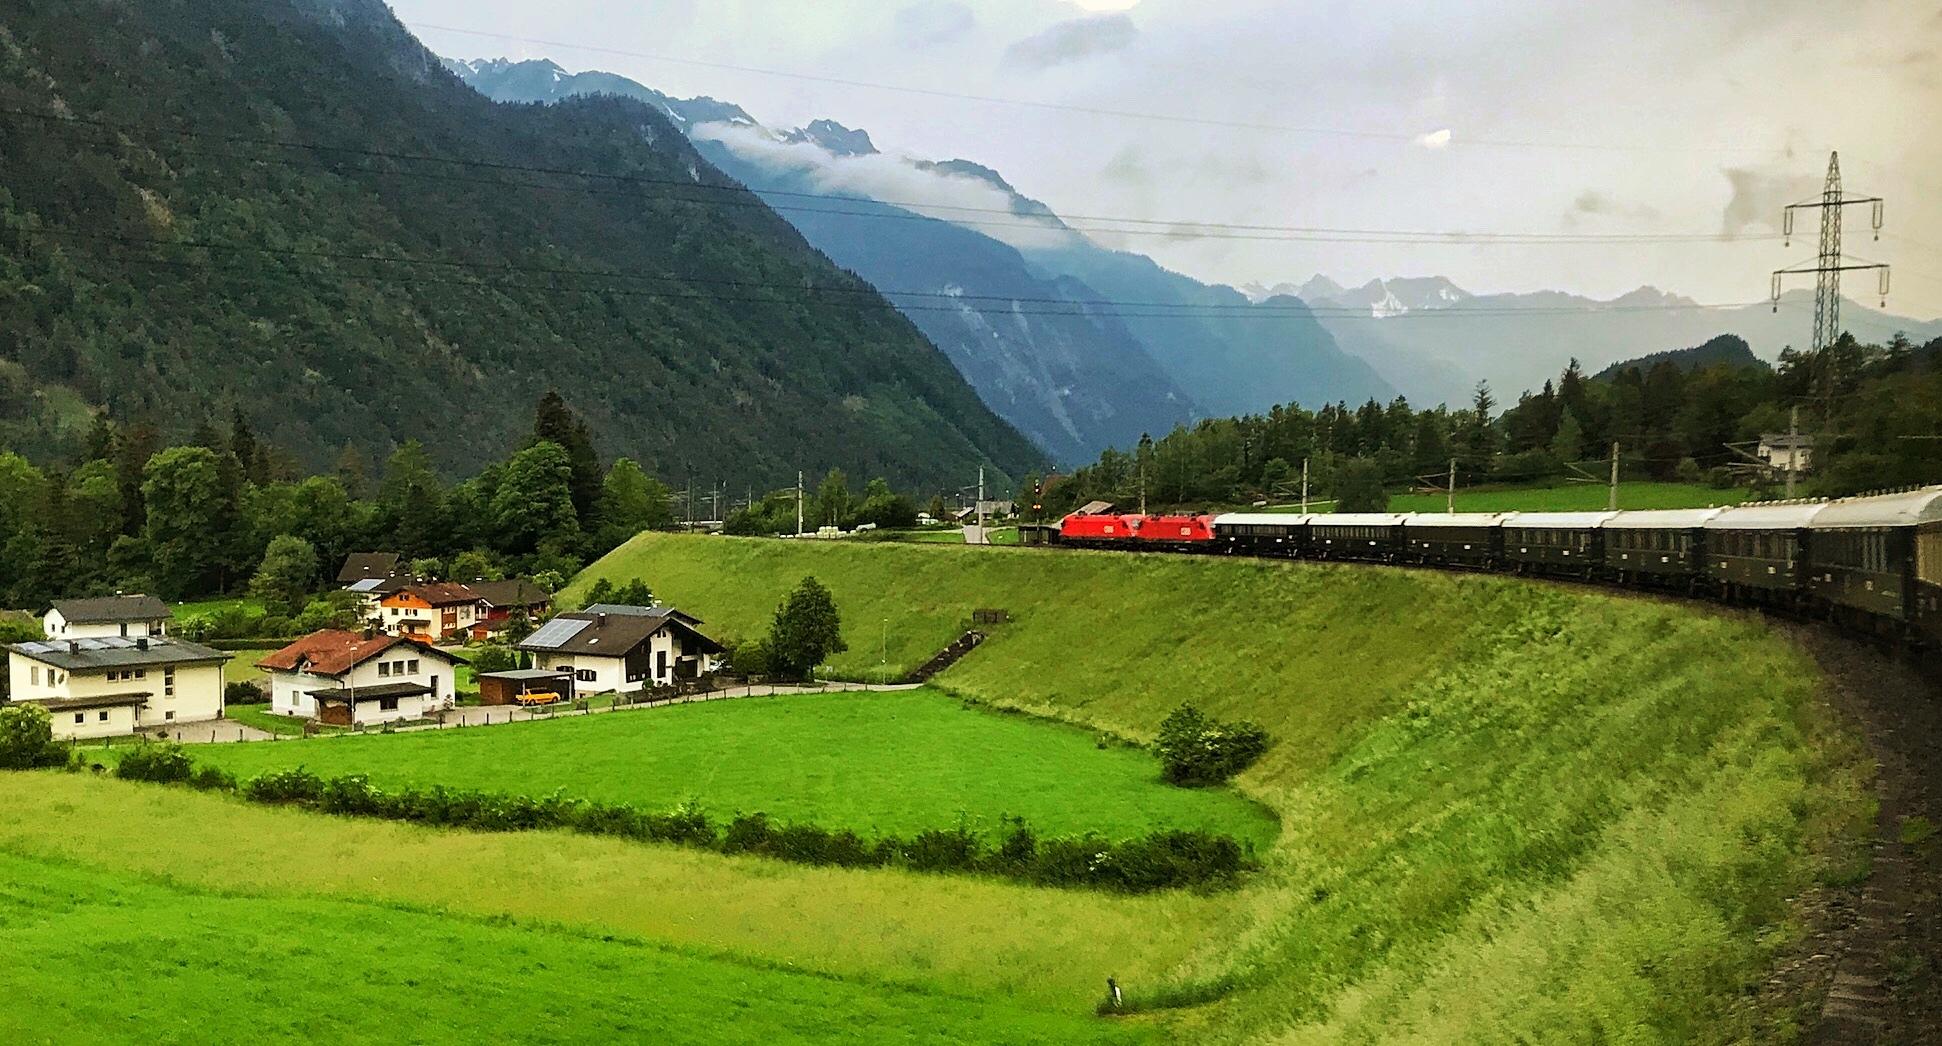 Exterior Orient Express Going through mountain.jpeg